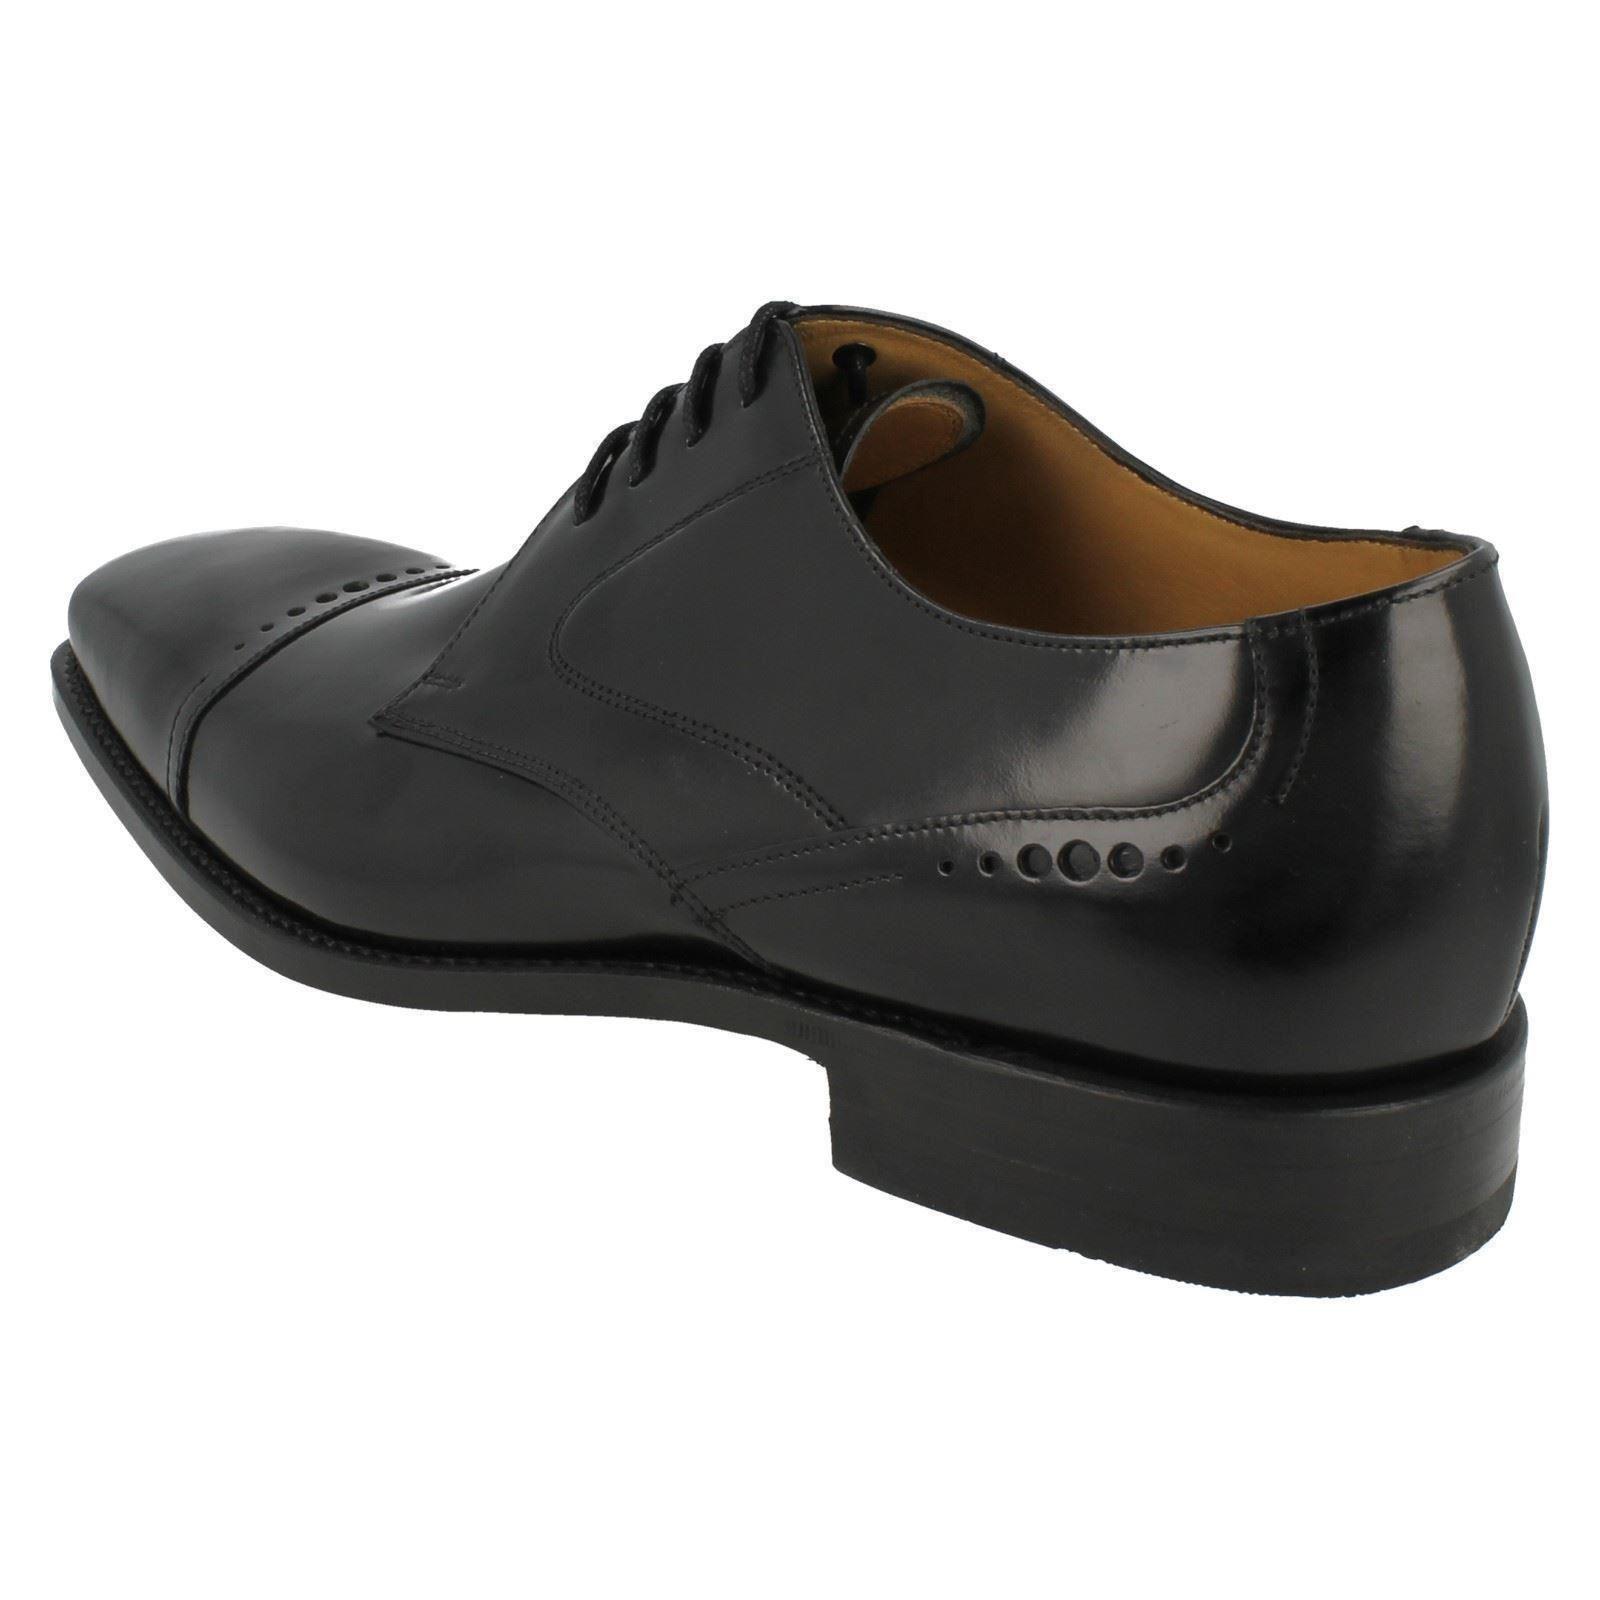 Uomo Loake Formal - Leder Schuhes Fitting G - Formal 250B 73e8bf